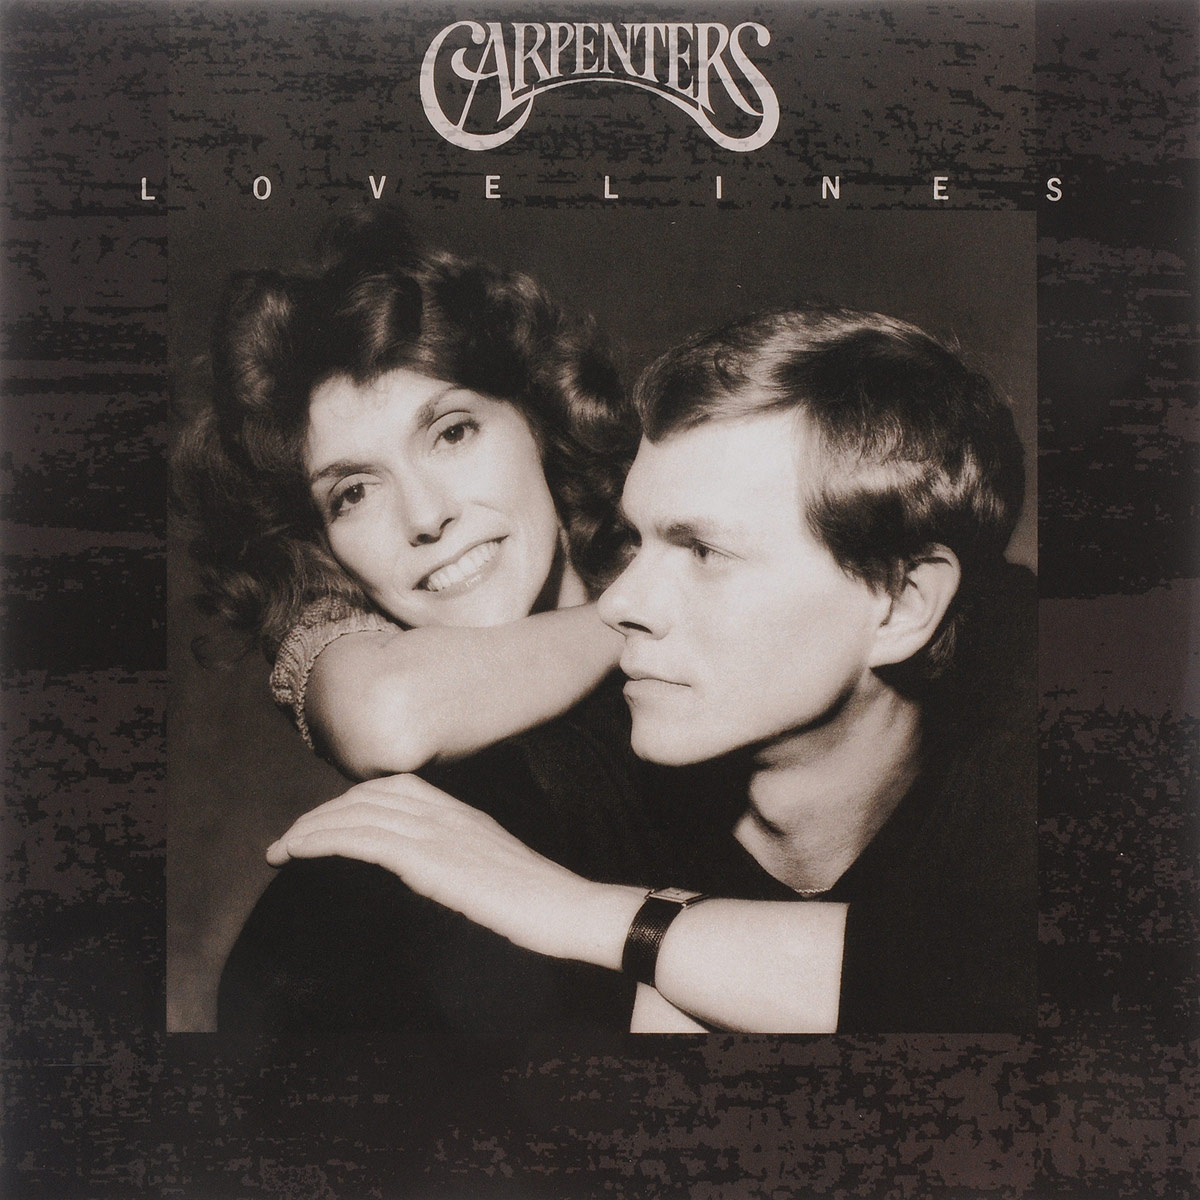 The Carpenters Carpenters. Lovelines (LP) the carpenters carpenters a song for you lp